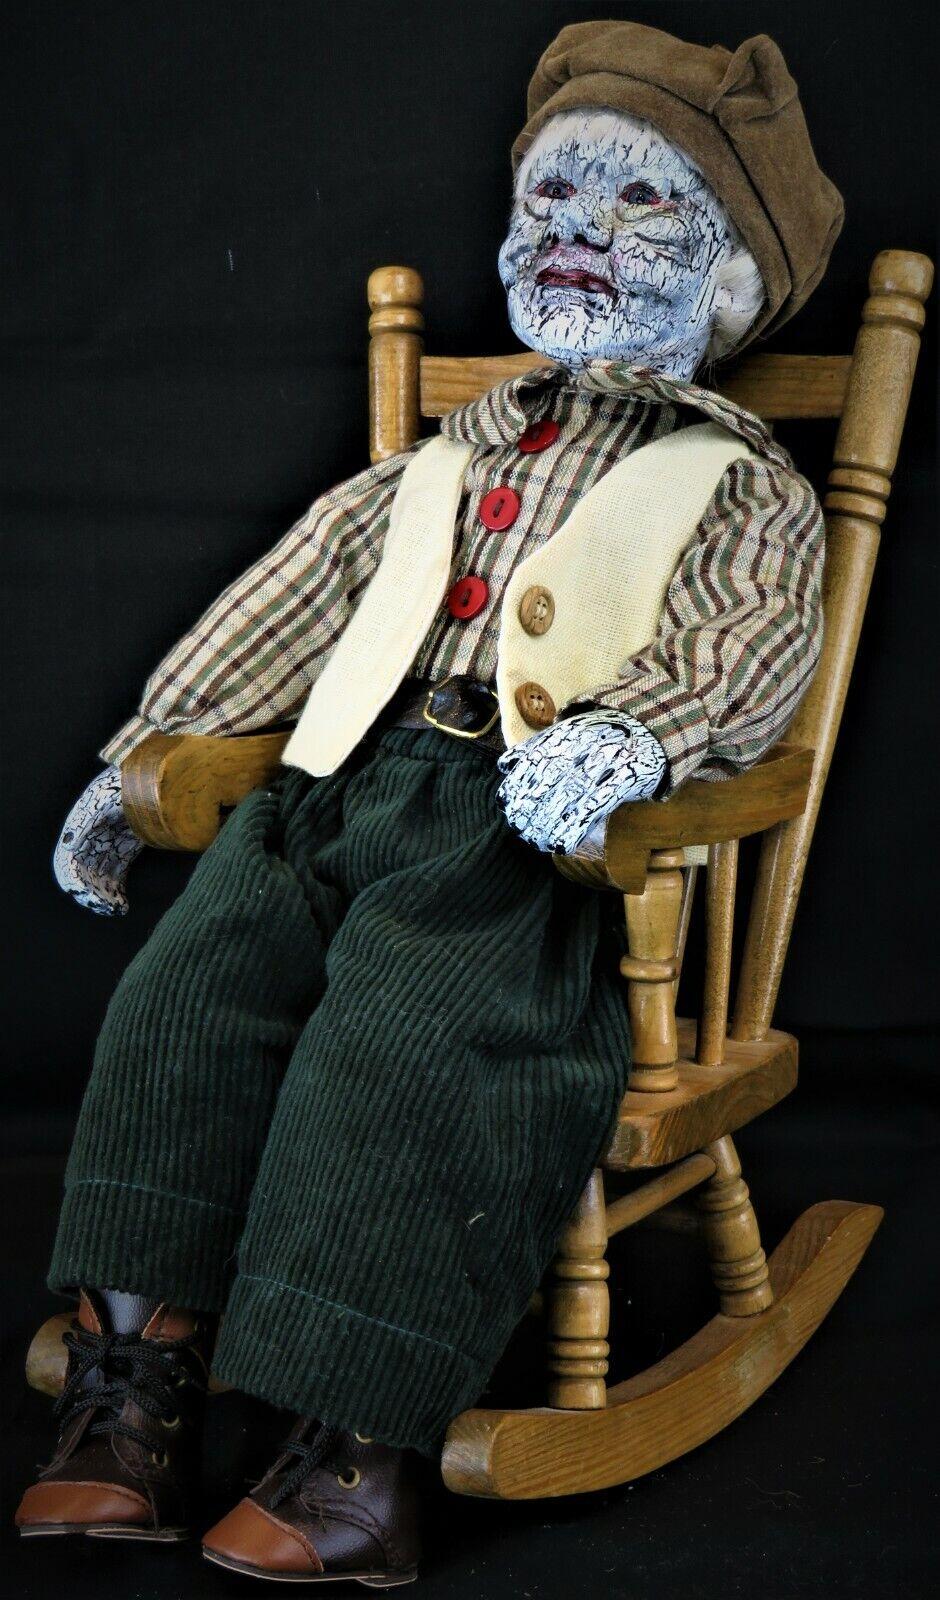 Mortimer By Wicked Wanda creations  OOAK creepy haunted horror Halloween doll